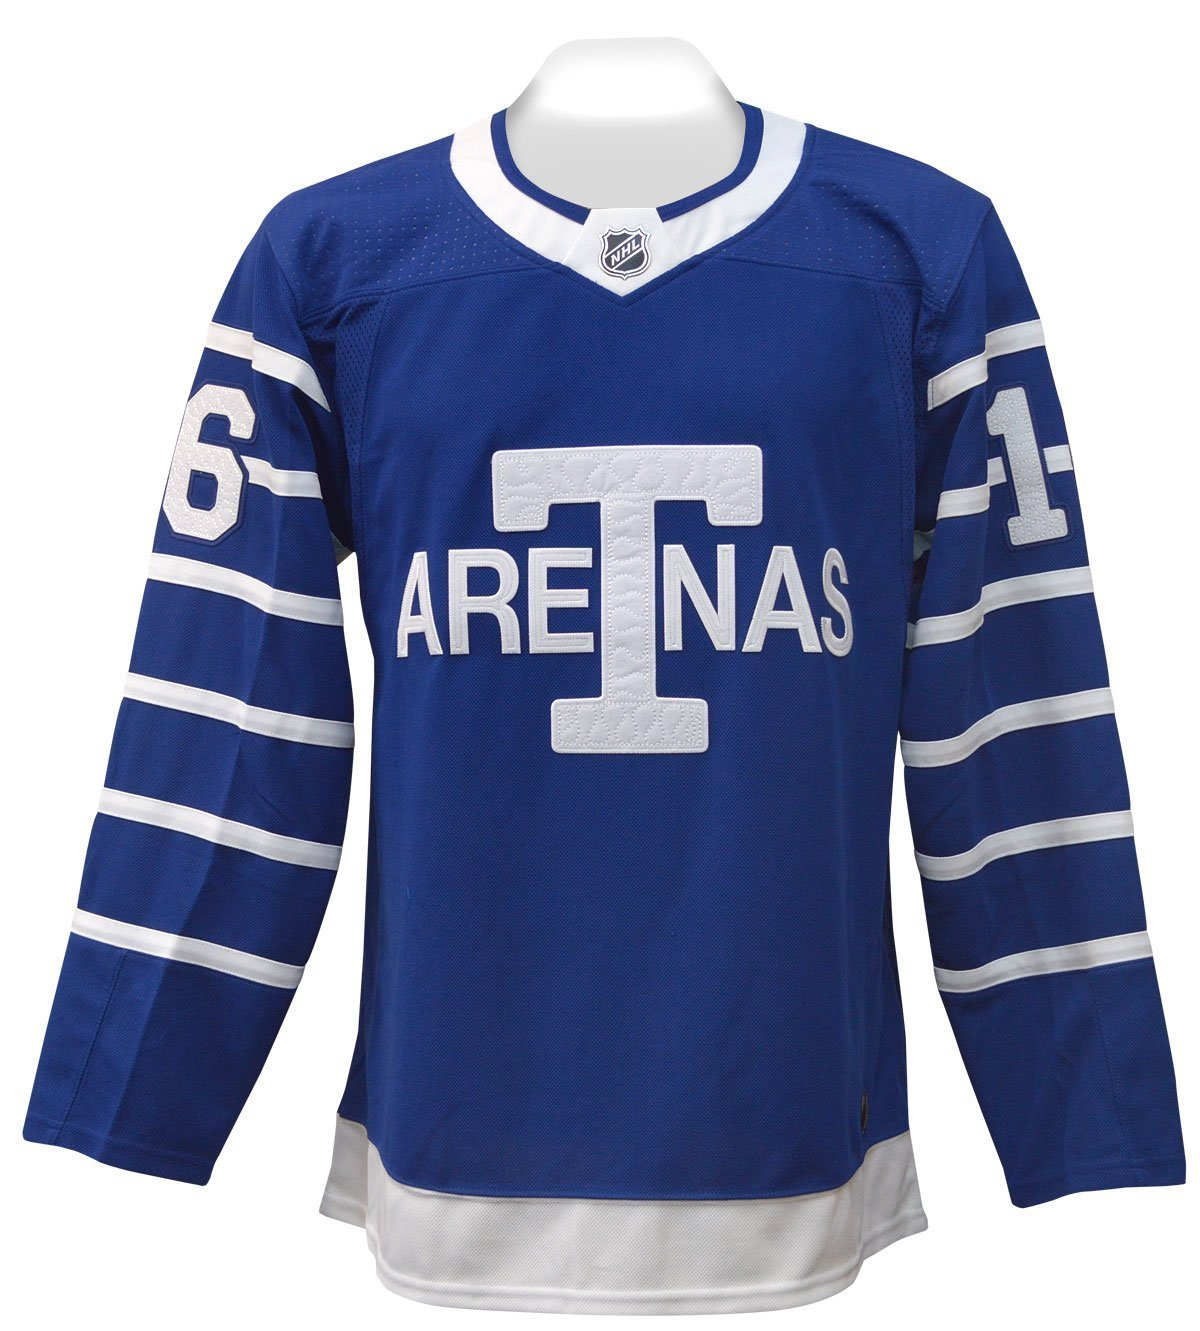 best service fd2f5 40d2b Amazon.com : adidas Toronto Maple Leafs Mitchell Marner ...